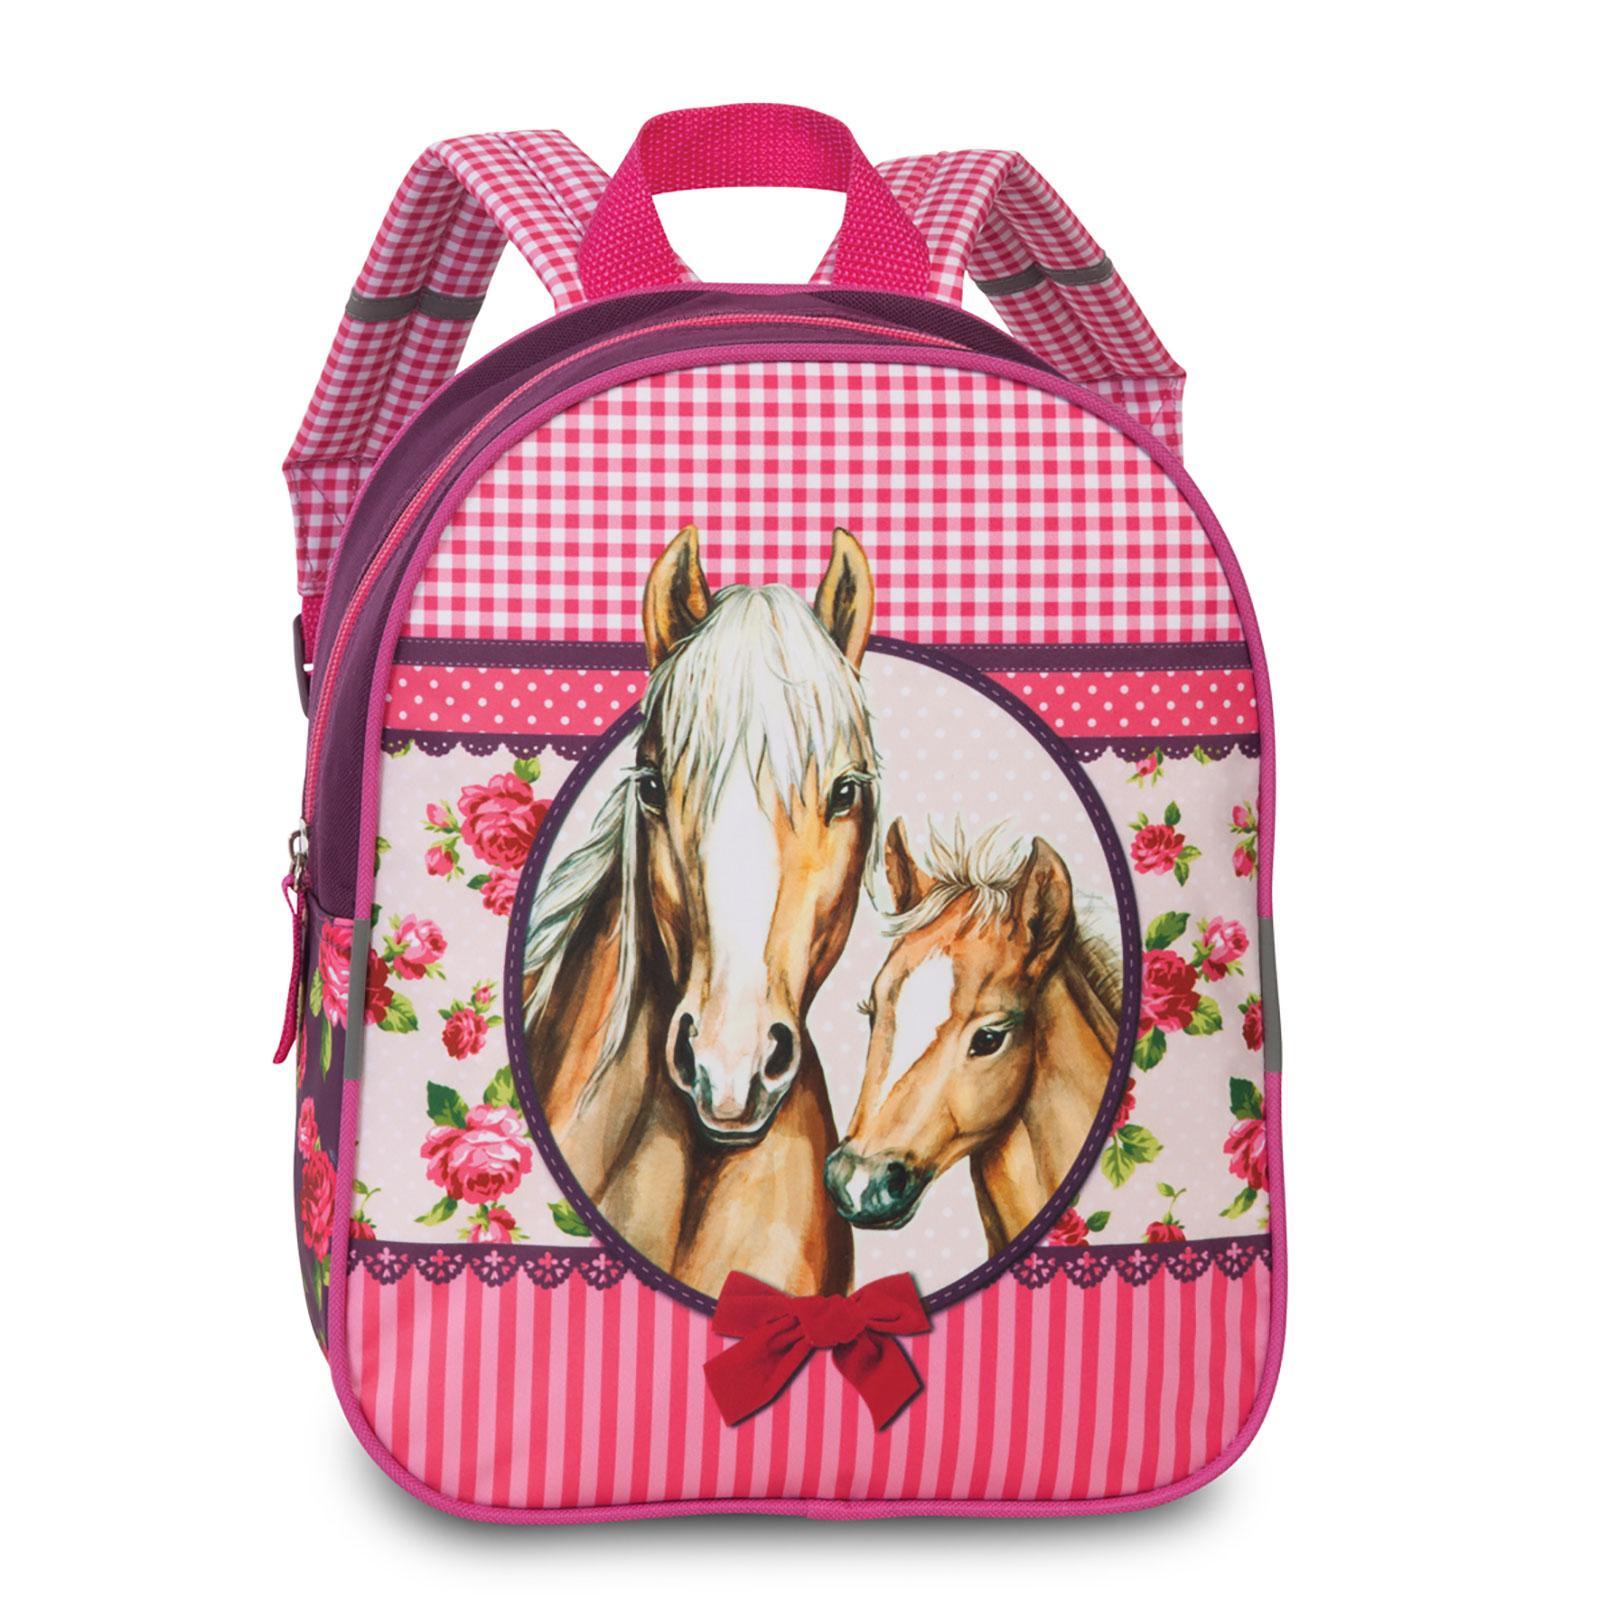 Fabrizio Kids Pferde Rucksack 29 cm 7 l - Pferde Pink 20618-2200